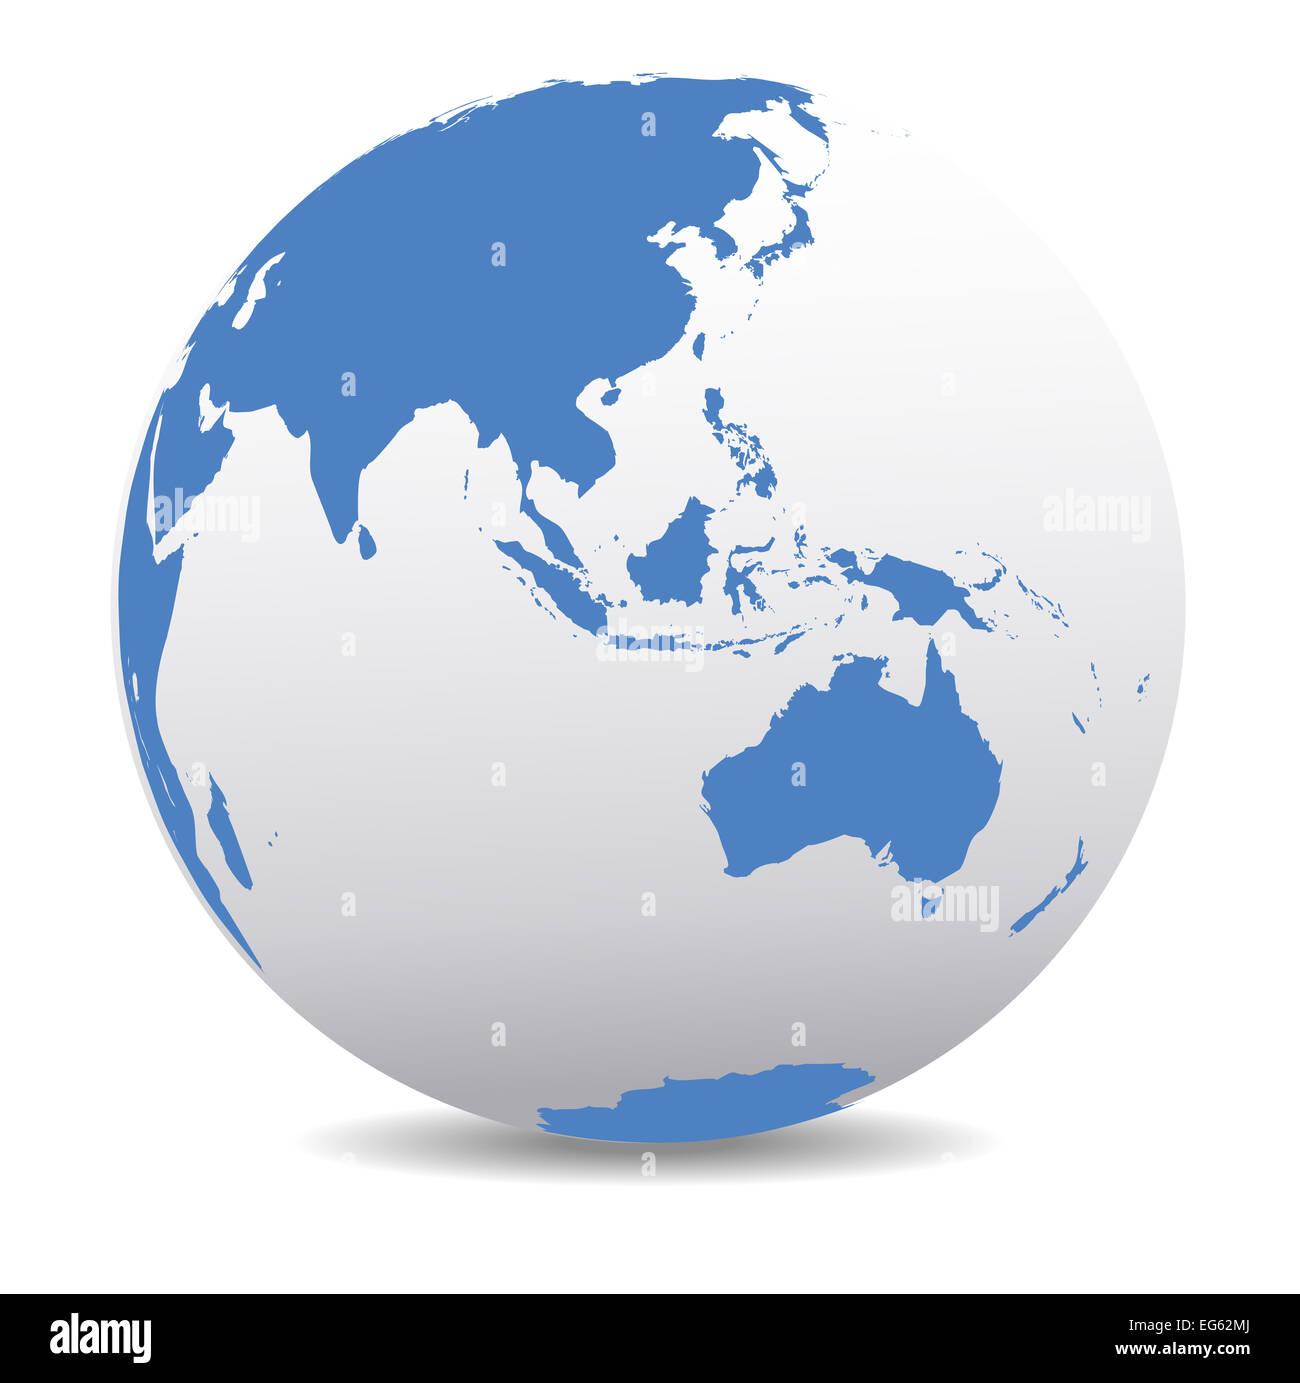 Picture of: Malaysia Philippines Australia World Earth Globe Stock Photo Alamy